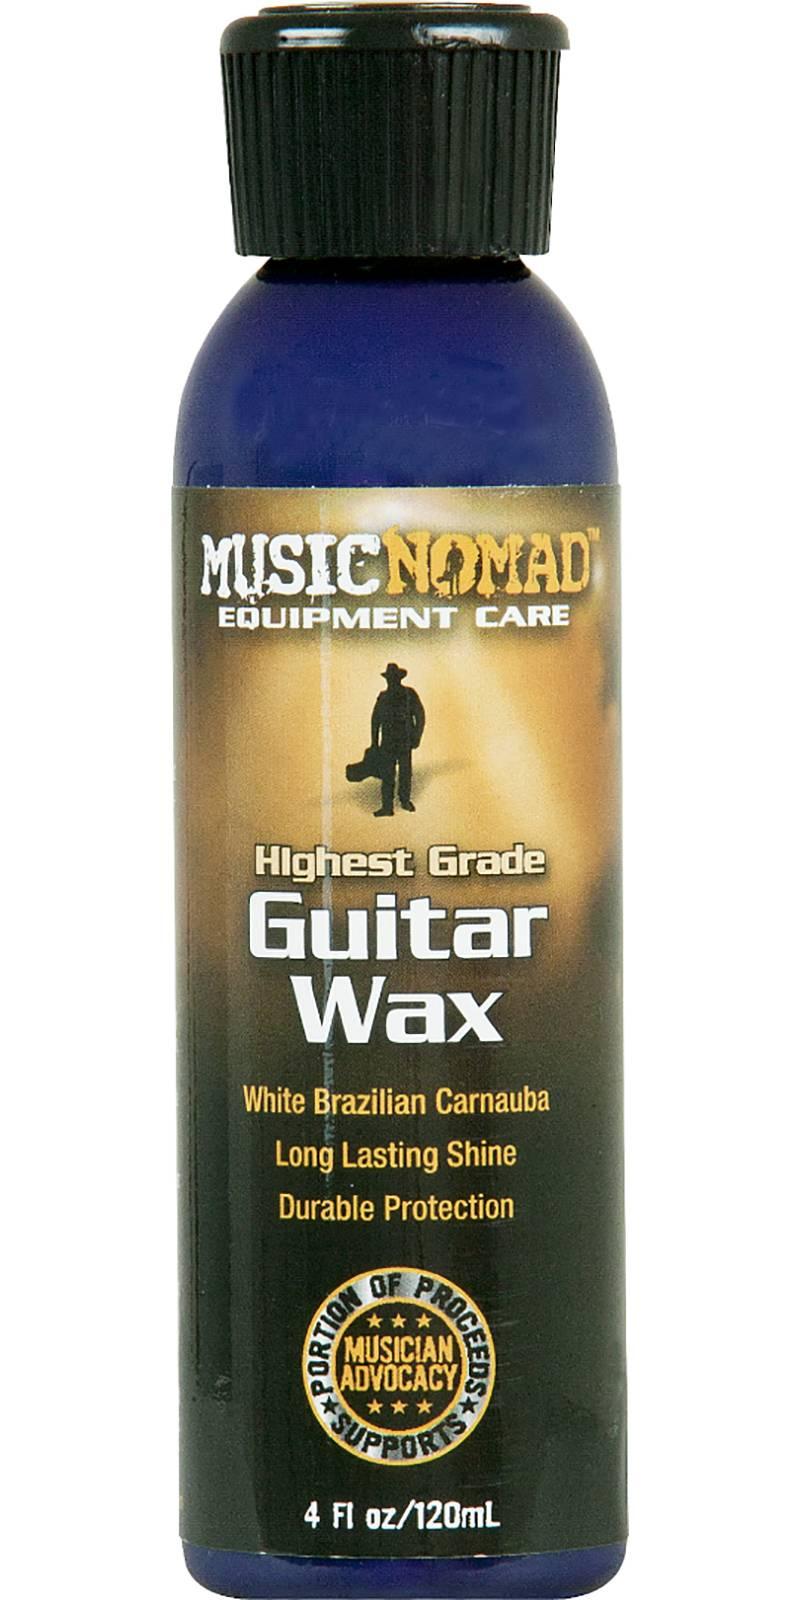 CERA MUSIC NOMAD GUITAR WAX